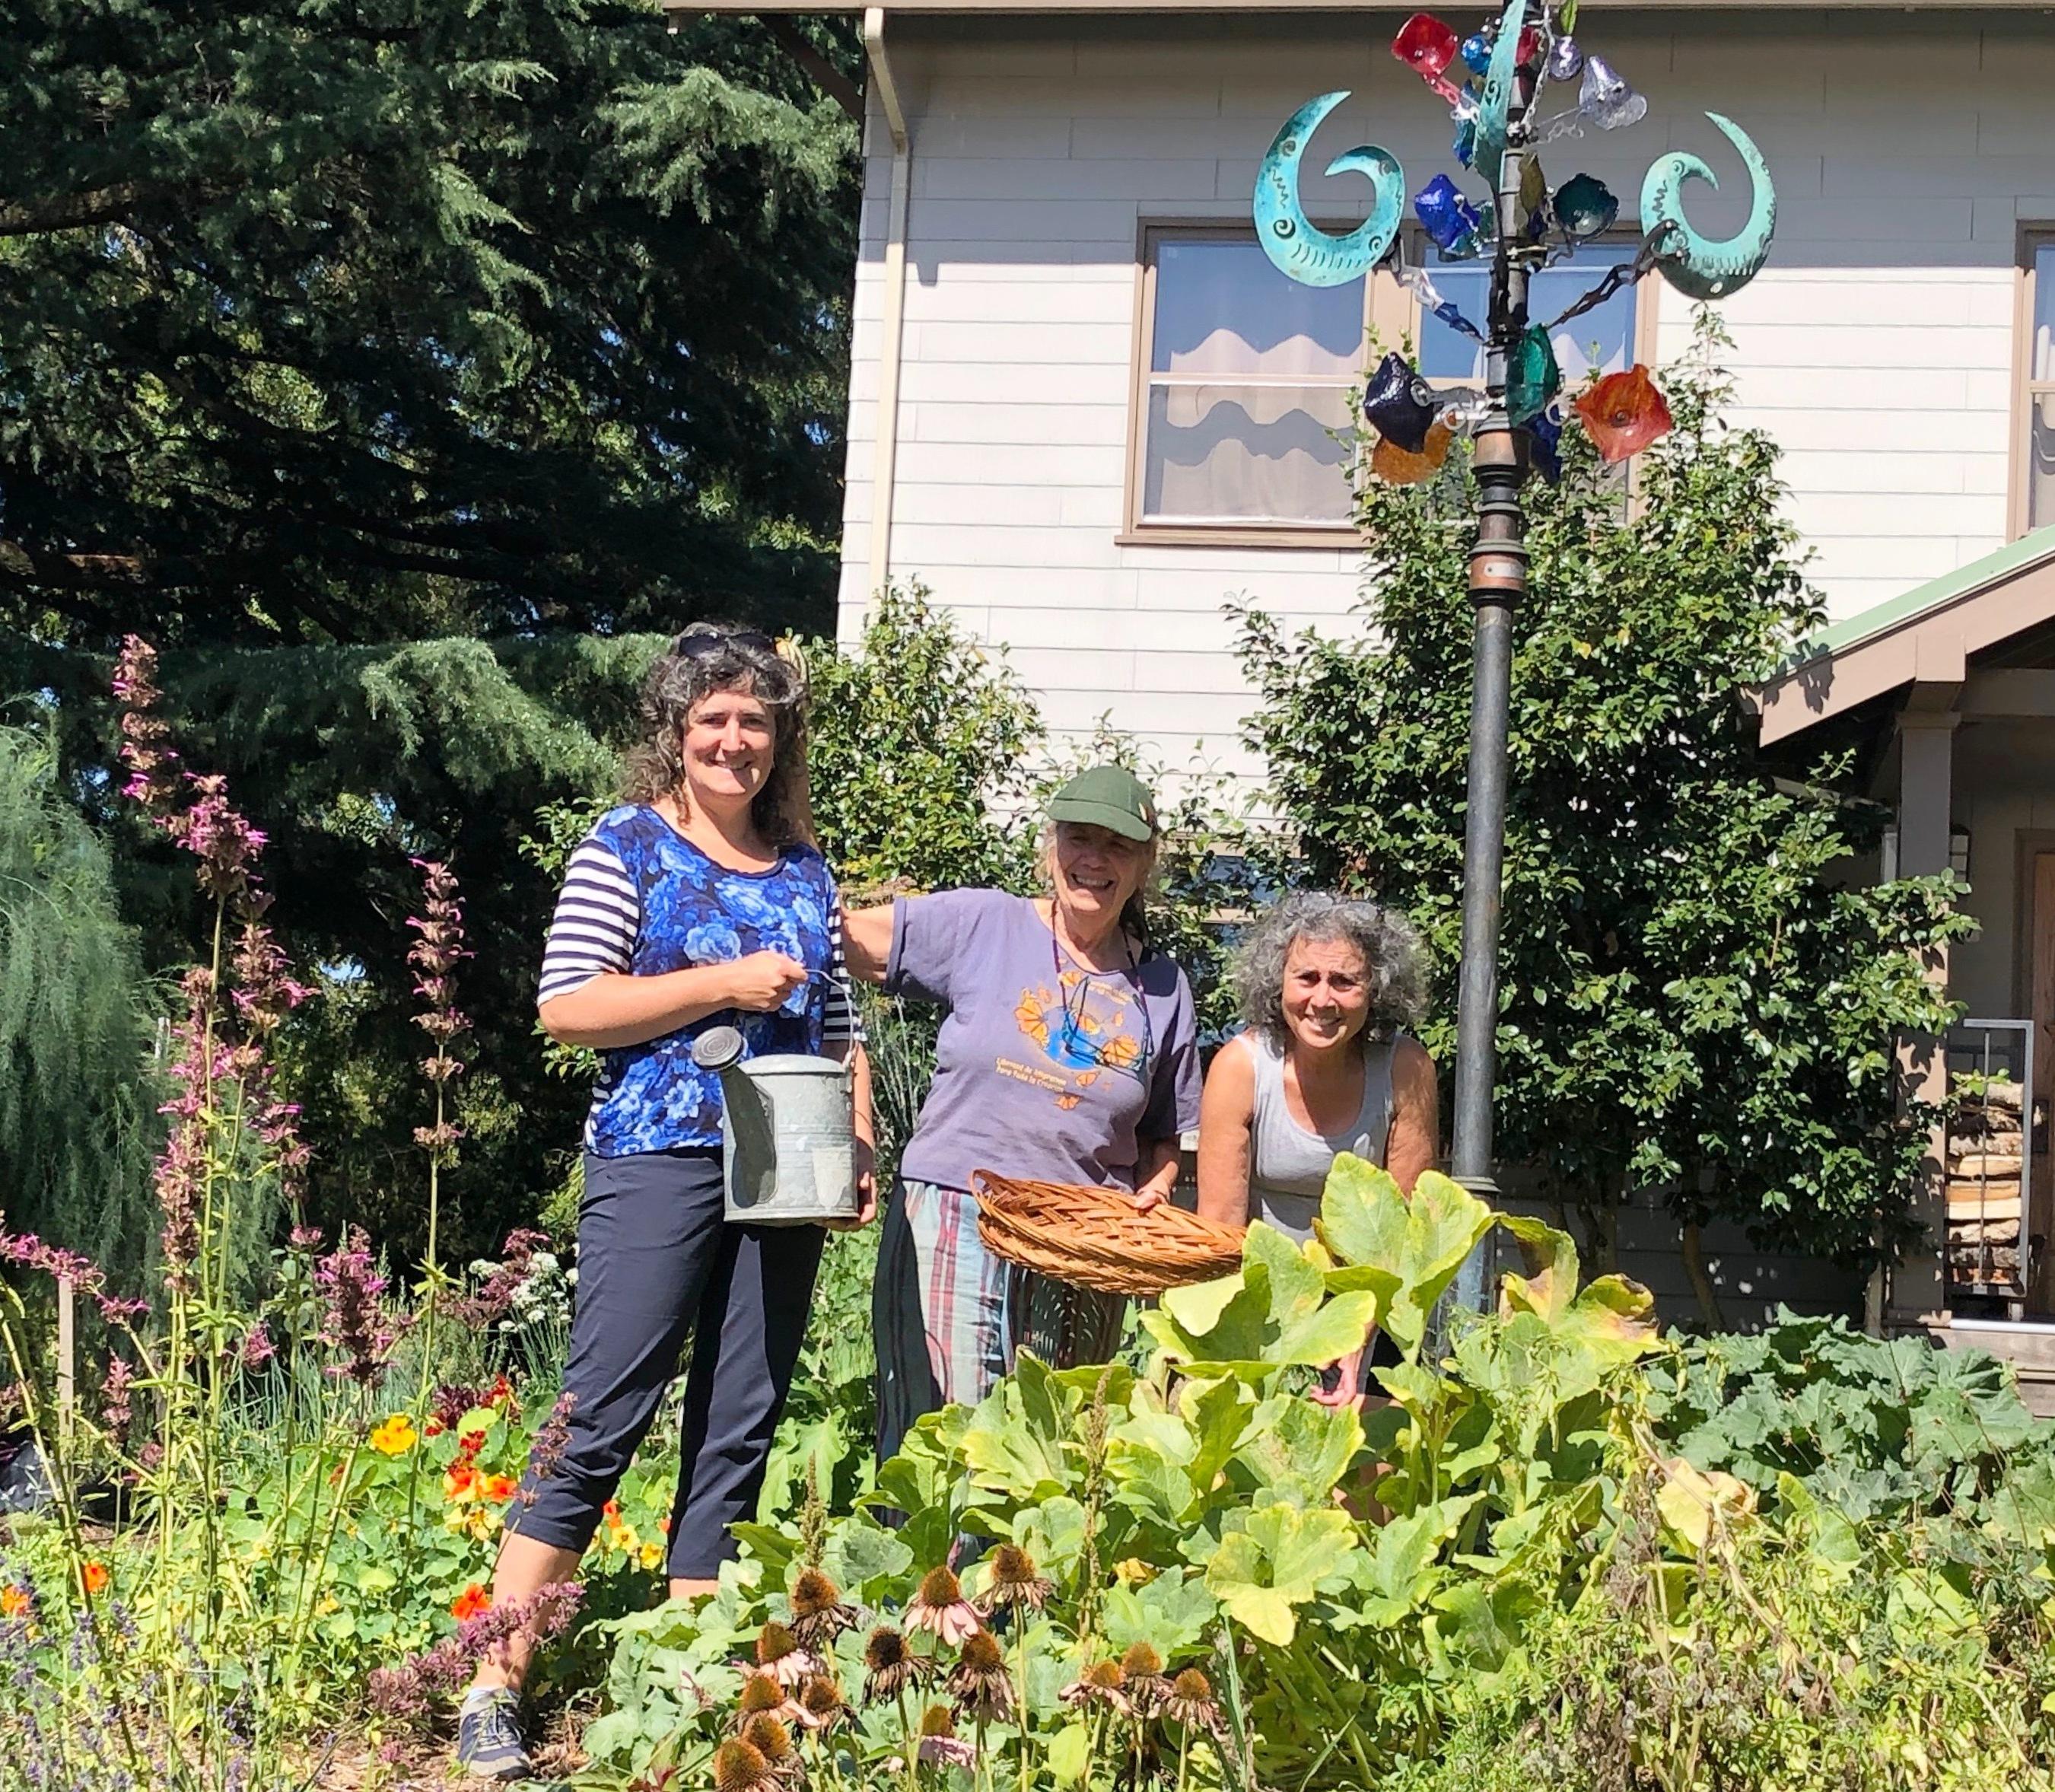 Ecovillage_cropped_photo.jpg